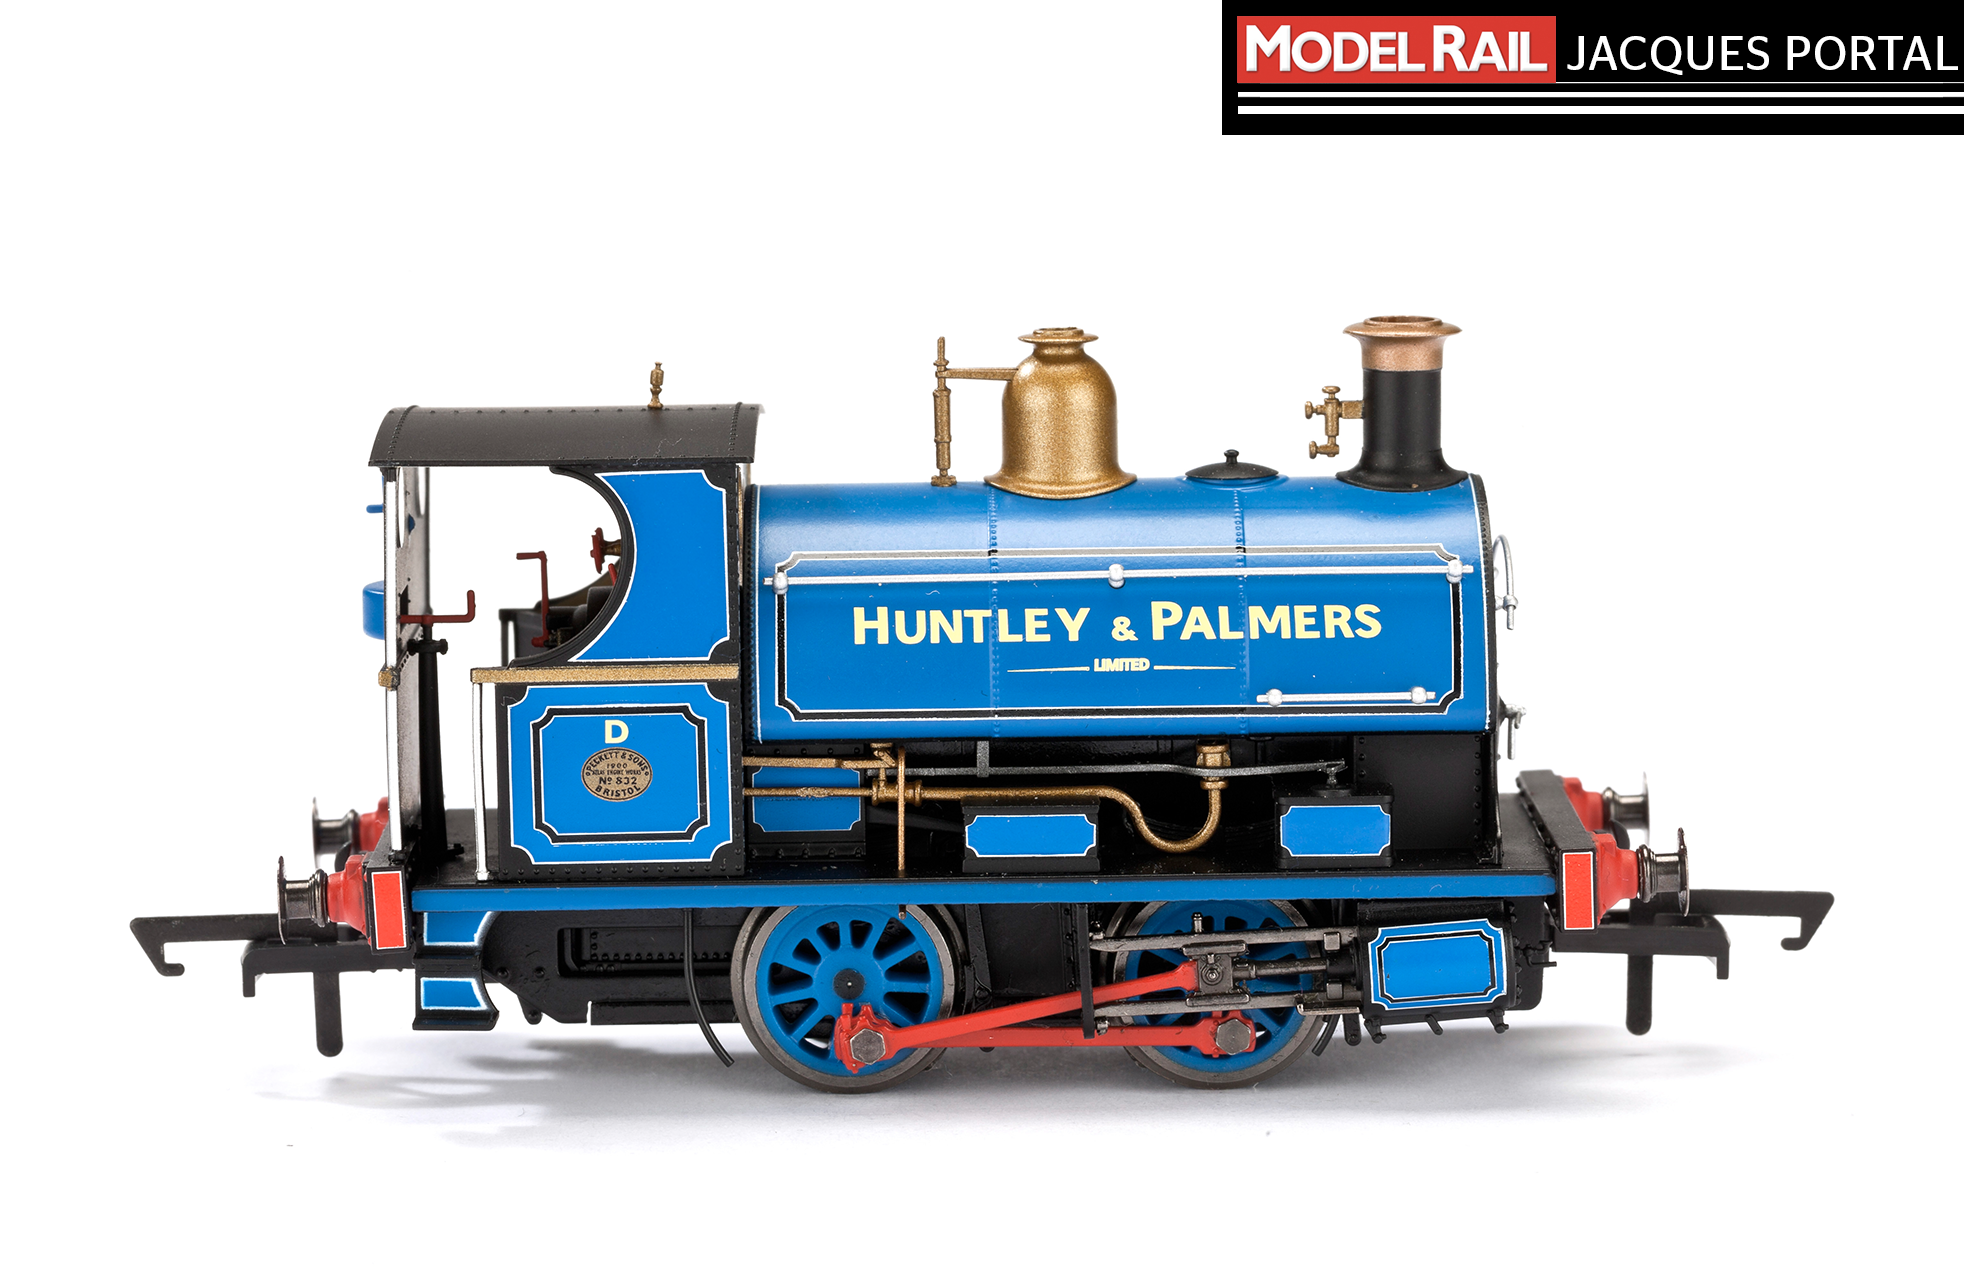 Hornby Peckett 'W4' 0-4-0ST, Huntley & Palmers blue. JACQUES PORTAL